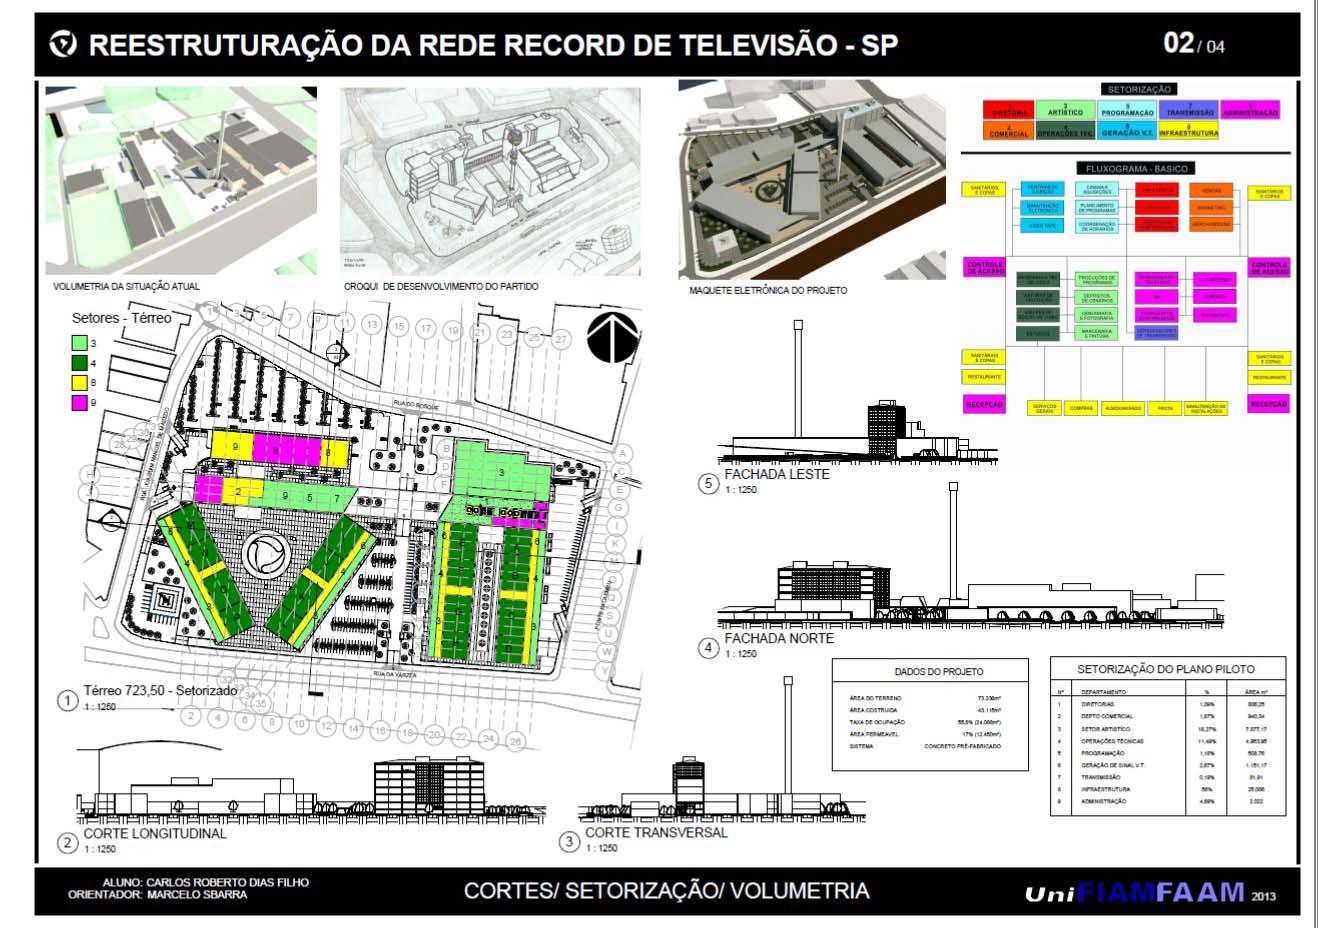 Rede Record - Prancha 02